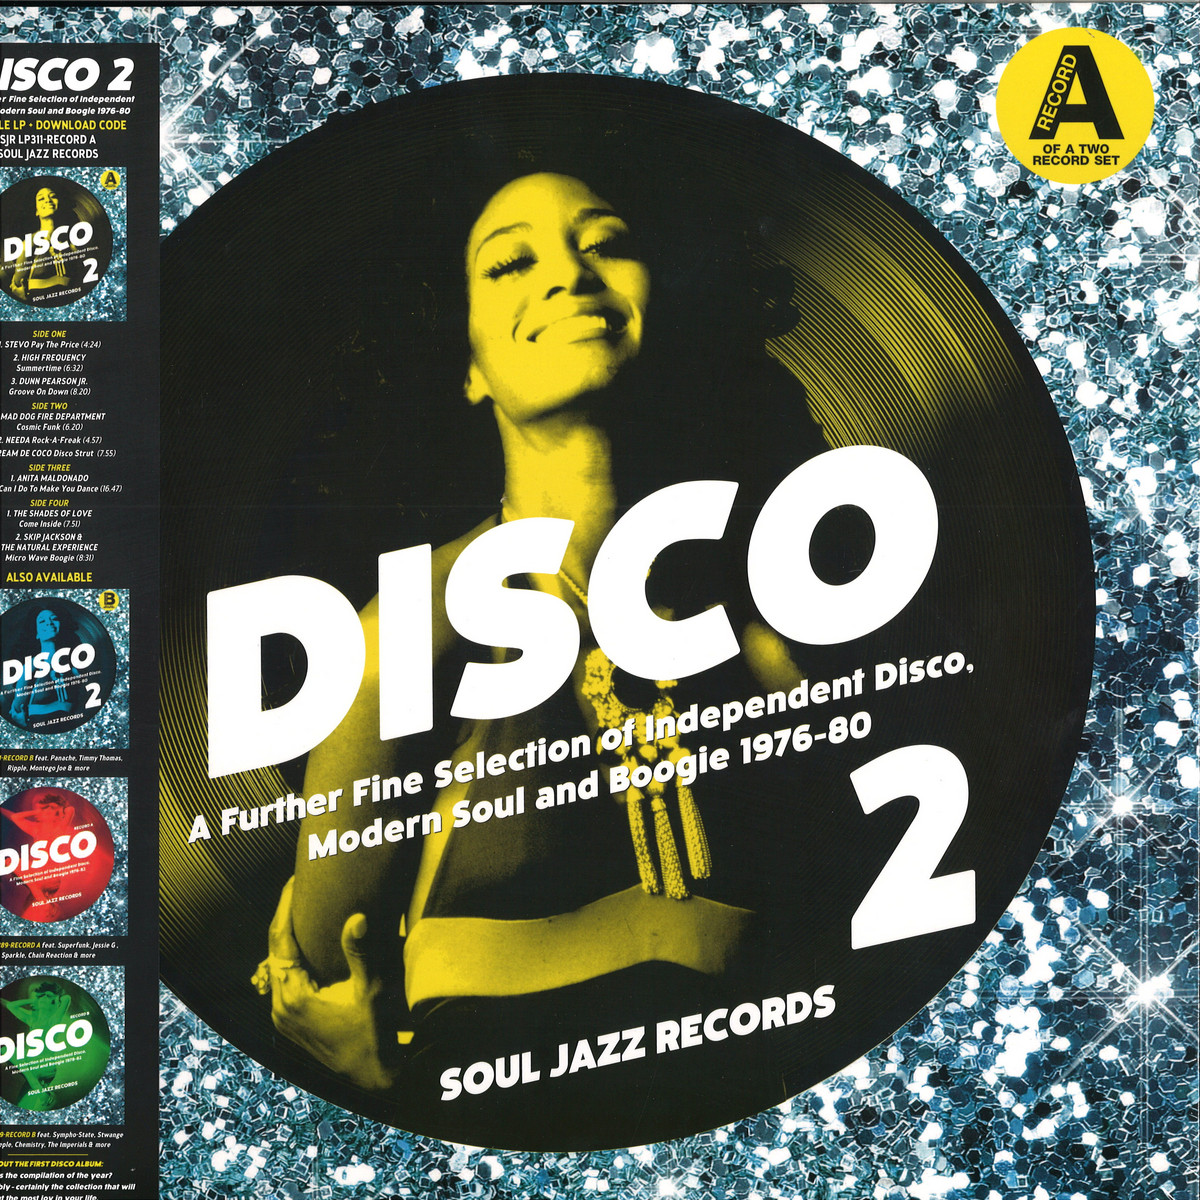 deejay de - Soul Jazz Records